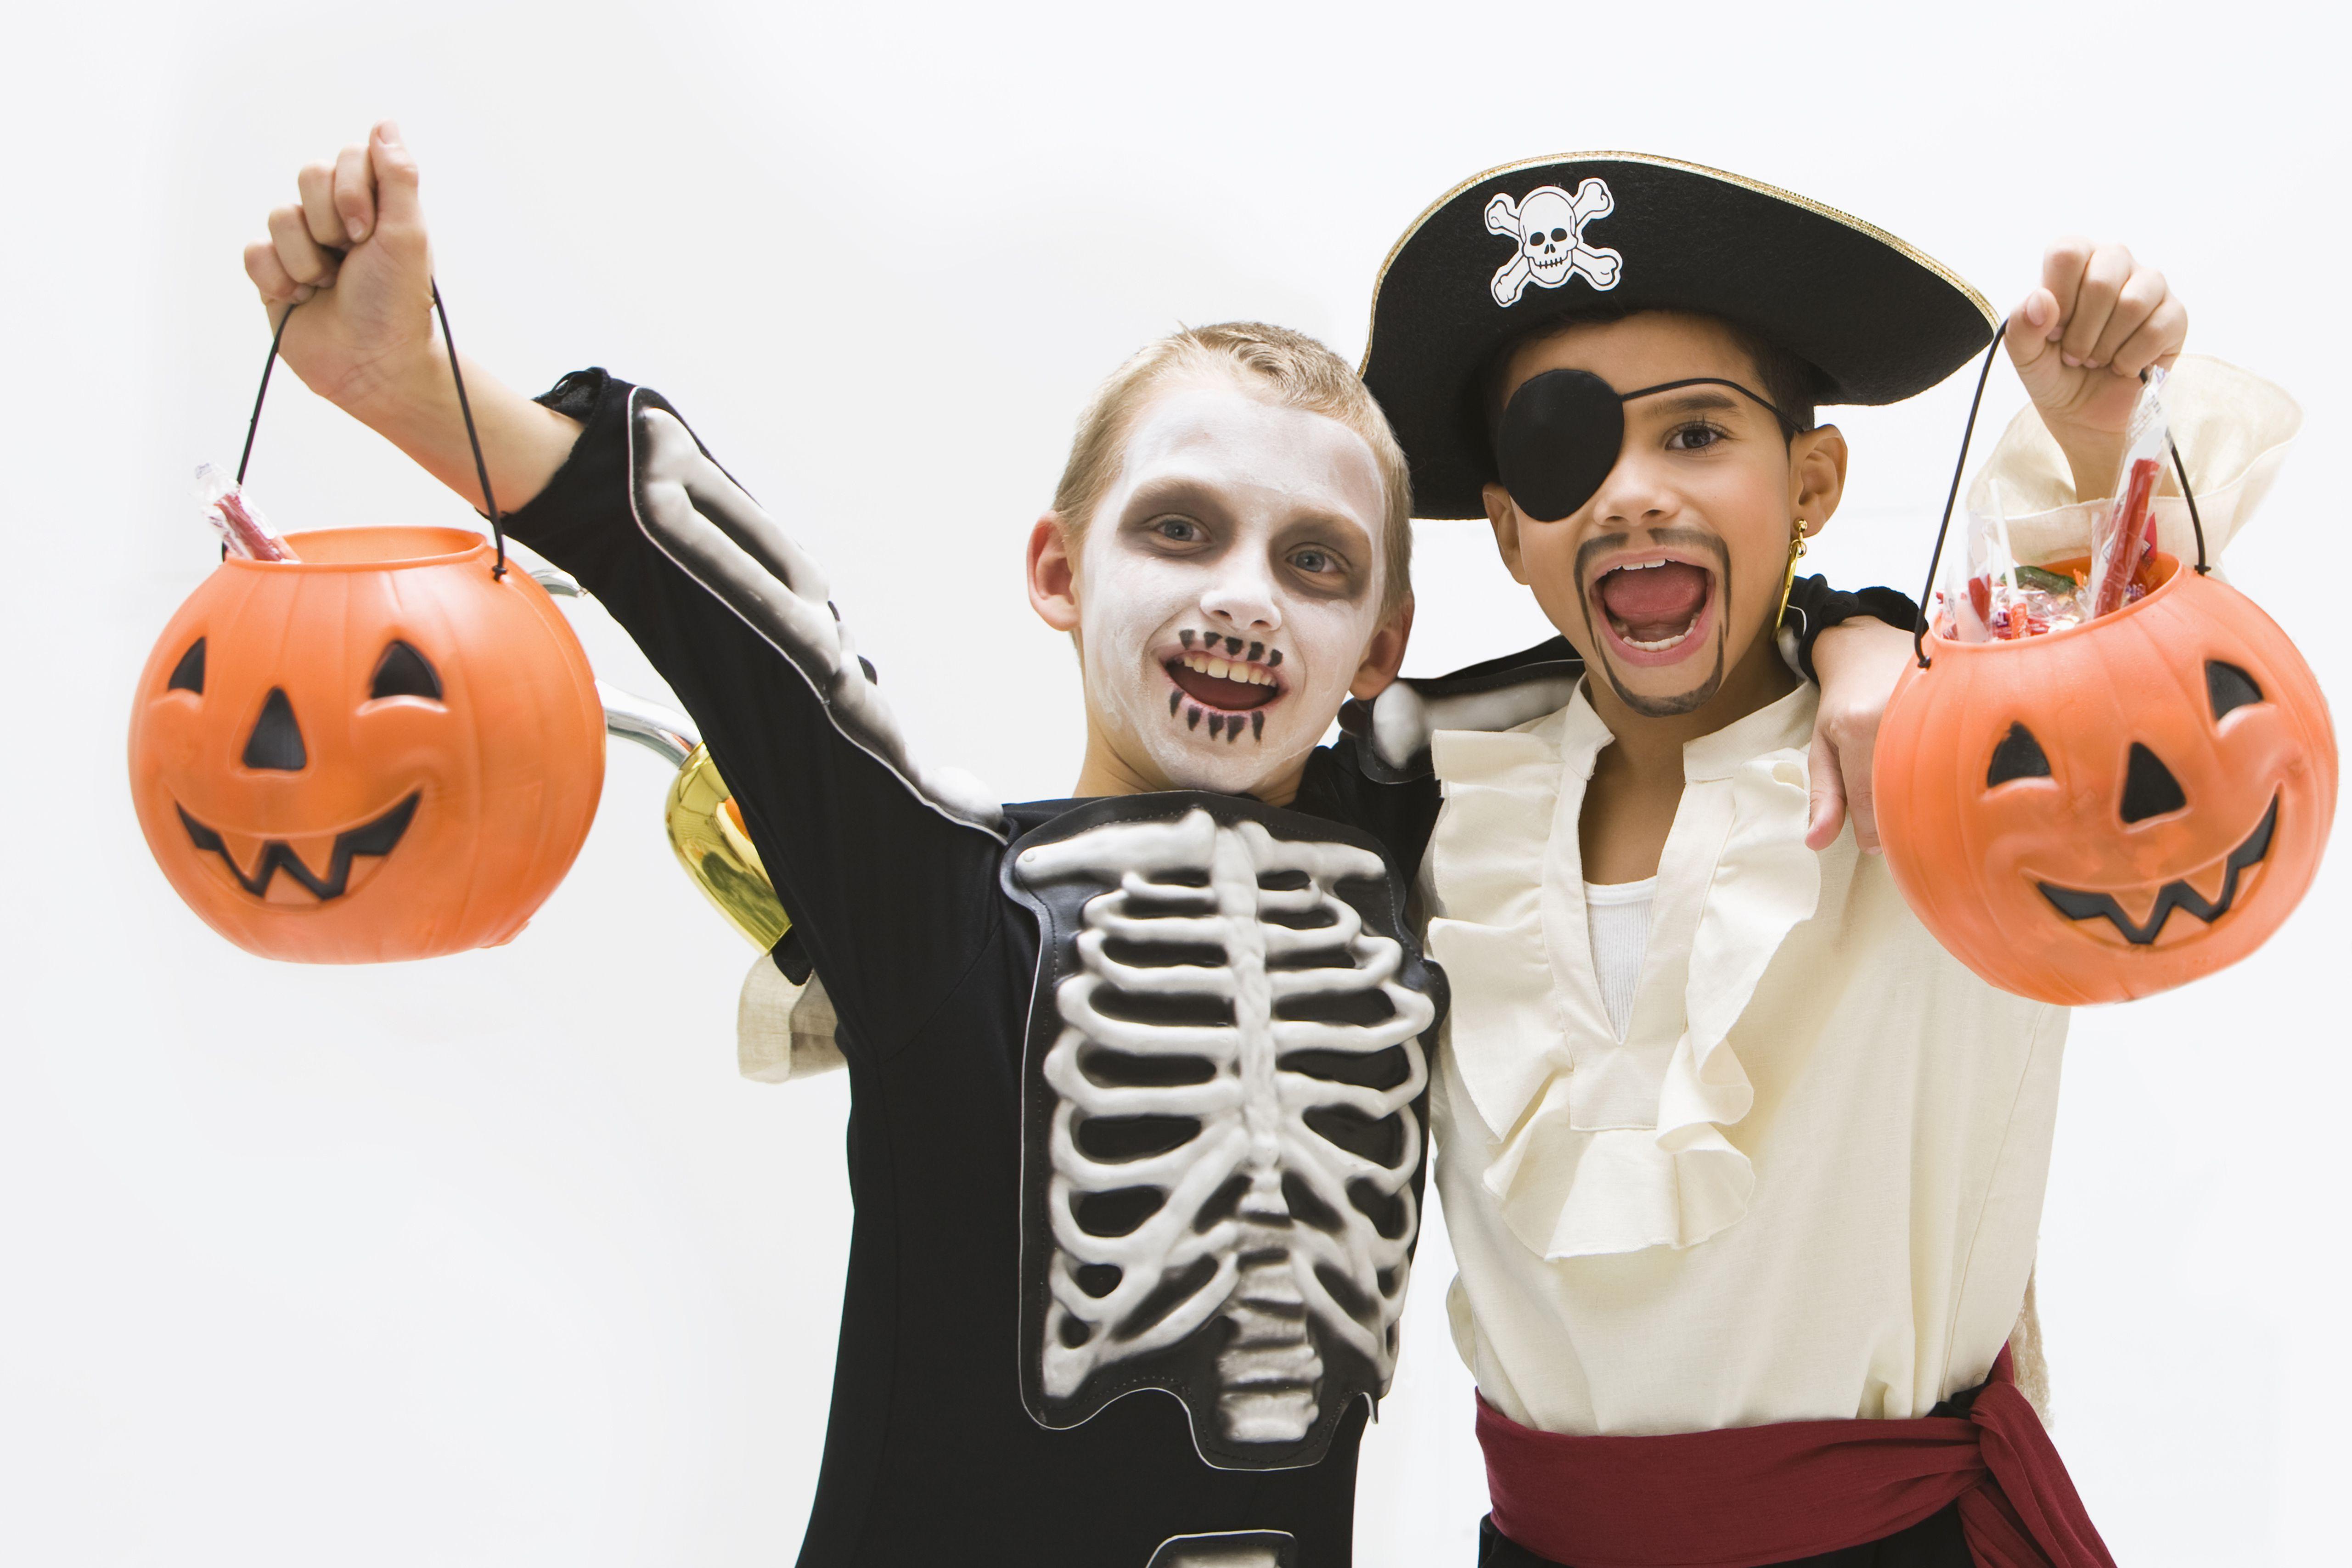 Retro Halloween Fun to With the Grandkids